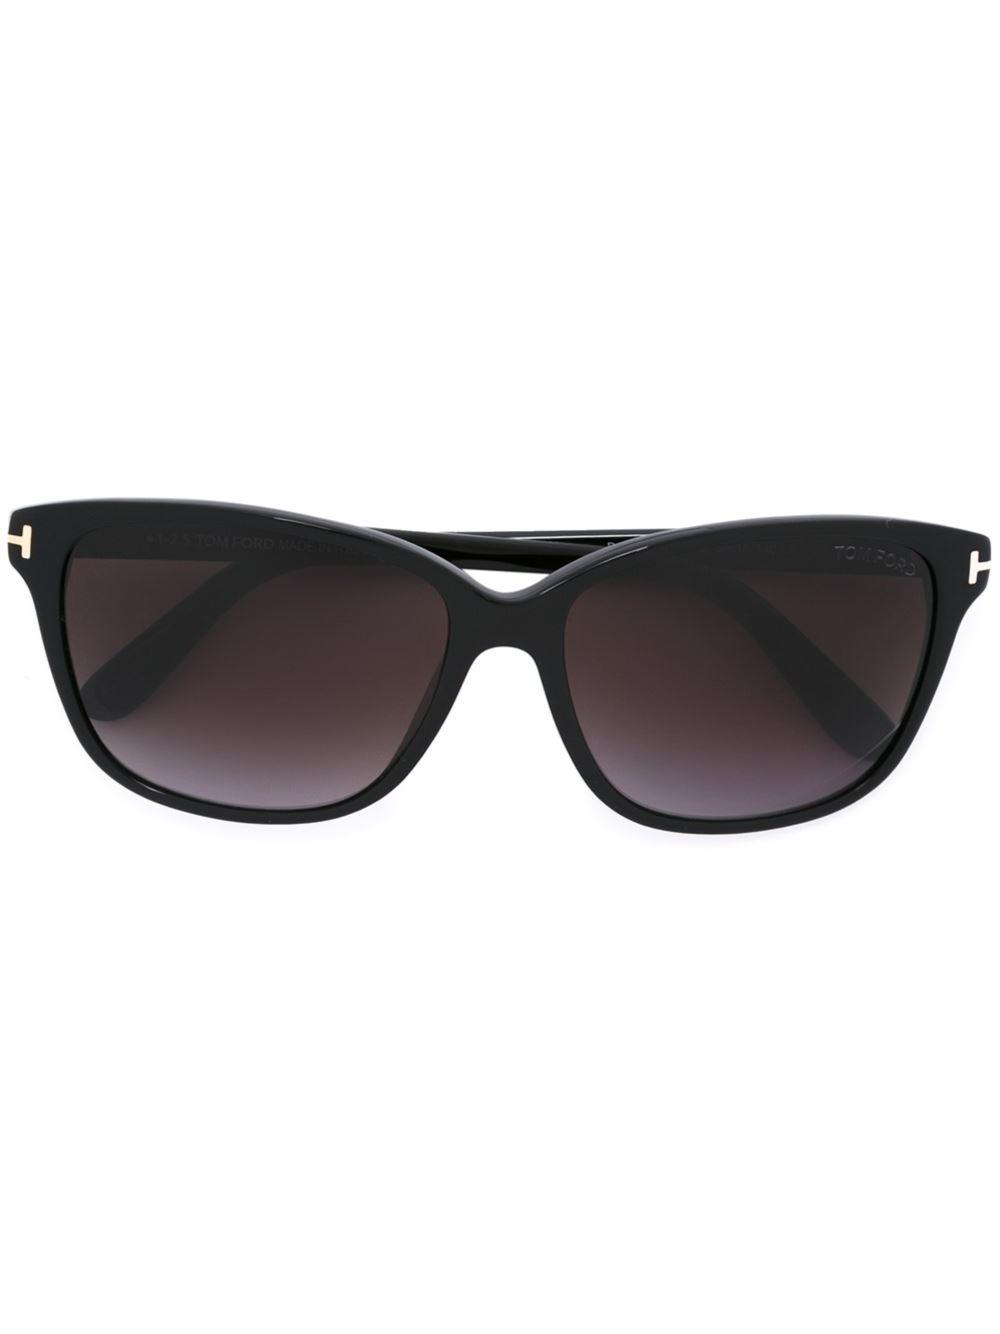 tom ford 39 dana 39 sunglasses in black lyst. Black Bedroom Furniture Sets. Home Design Ideas